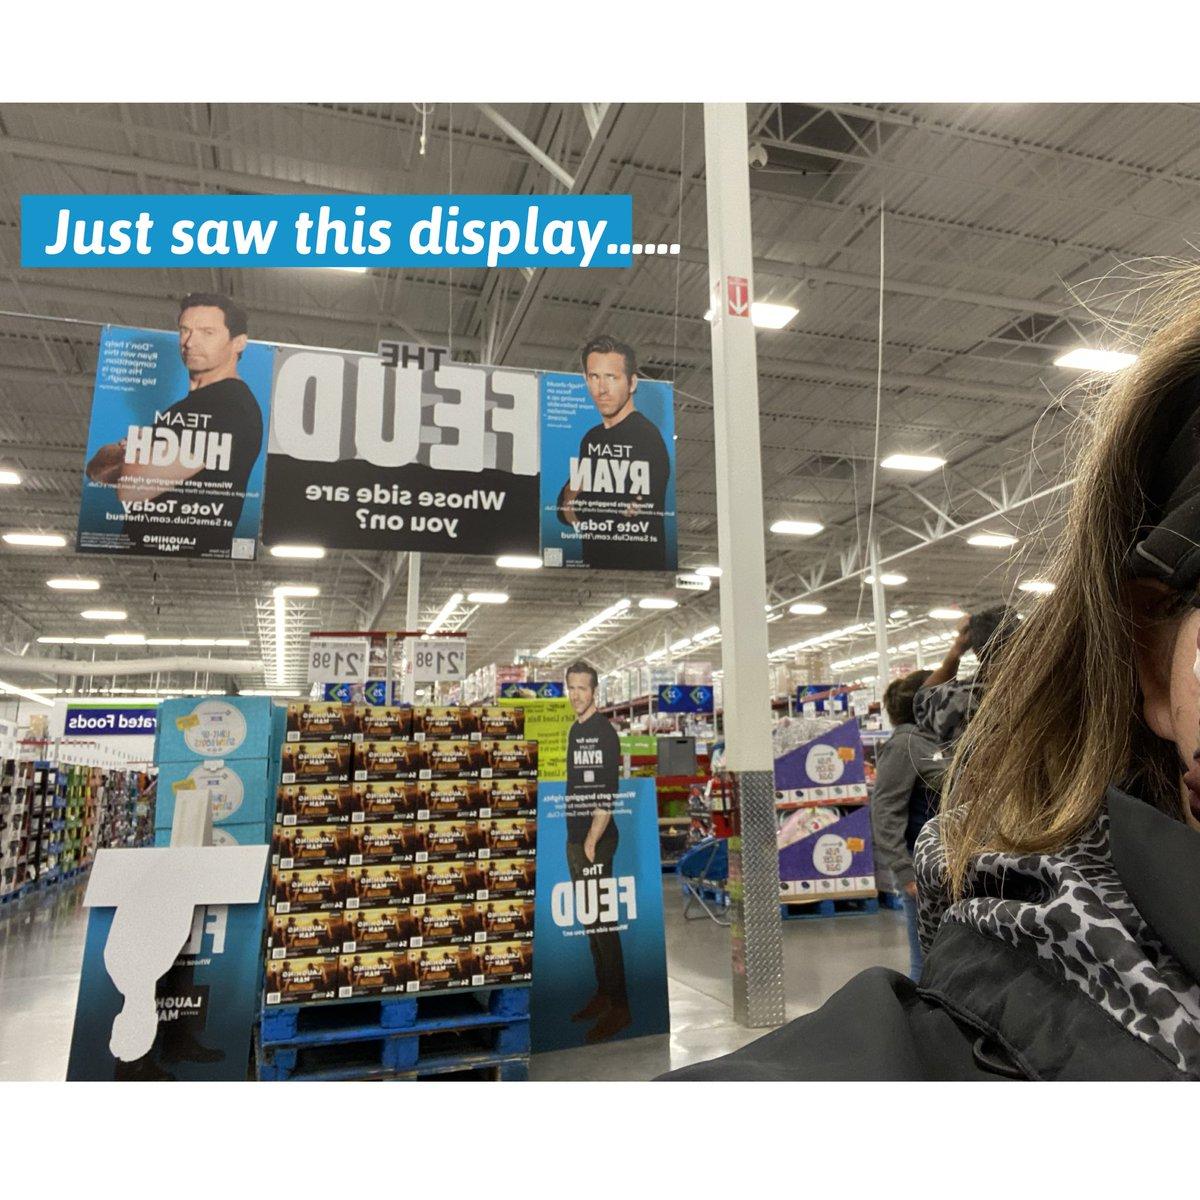 I can't make this up....sorry @RealHughJackman looks like shoppers at this #KansasCity @SamsClub #voted @VancityReynolds @sickkids @laughingmanco @AviationGin #LaughingManFoundation